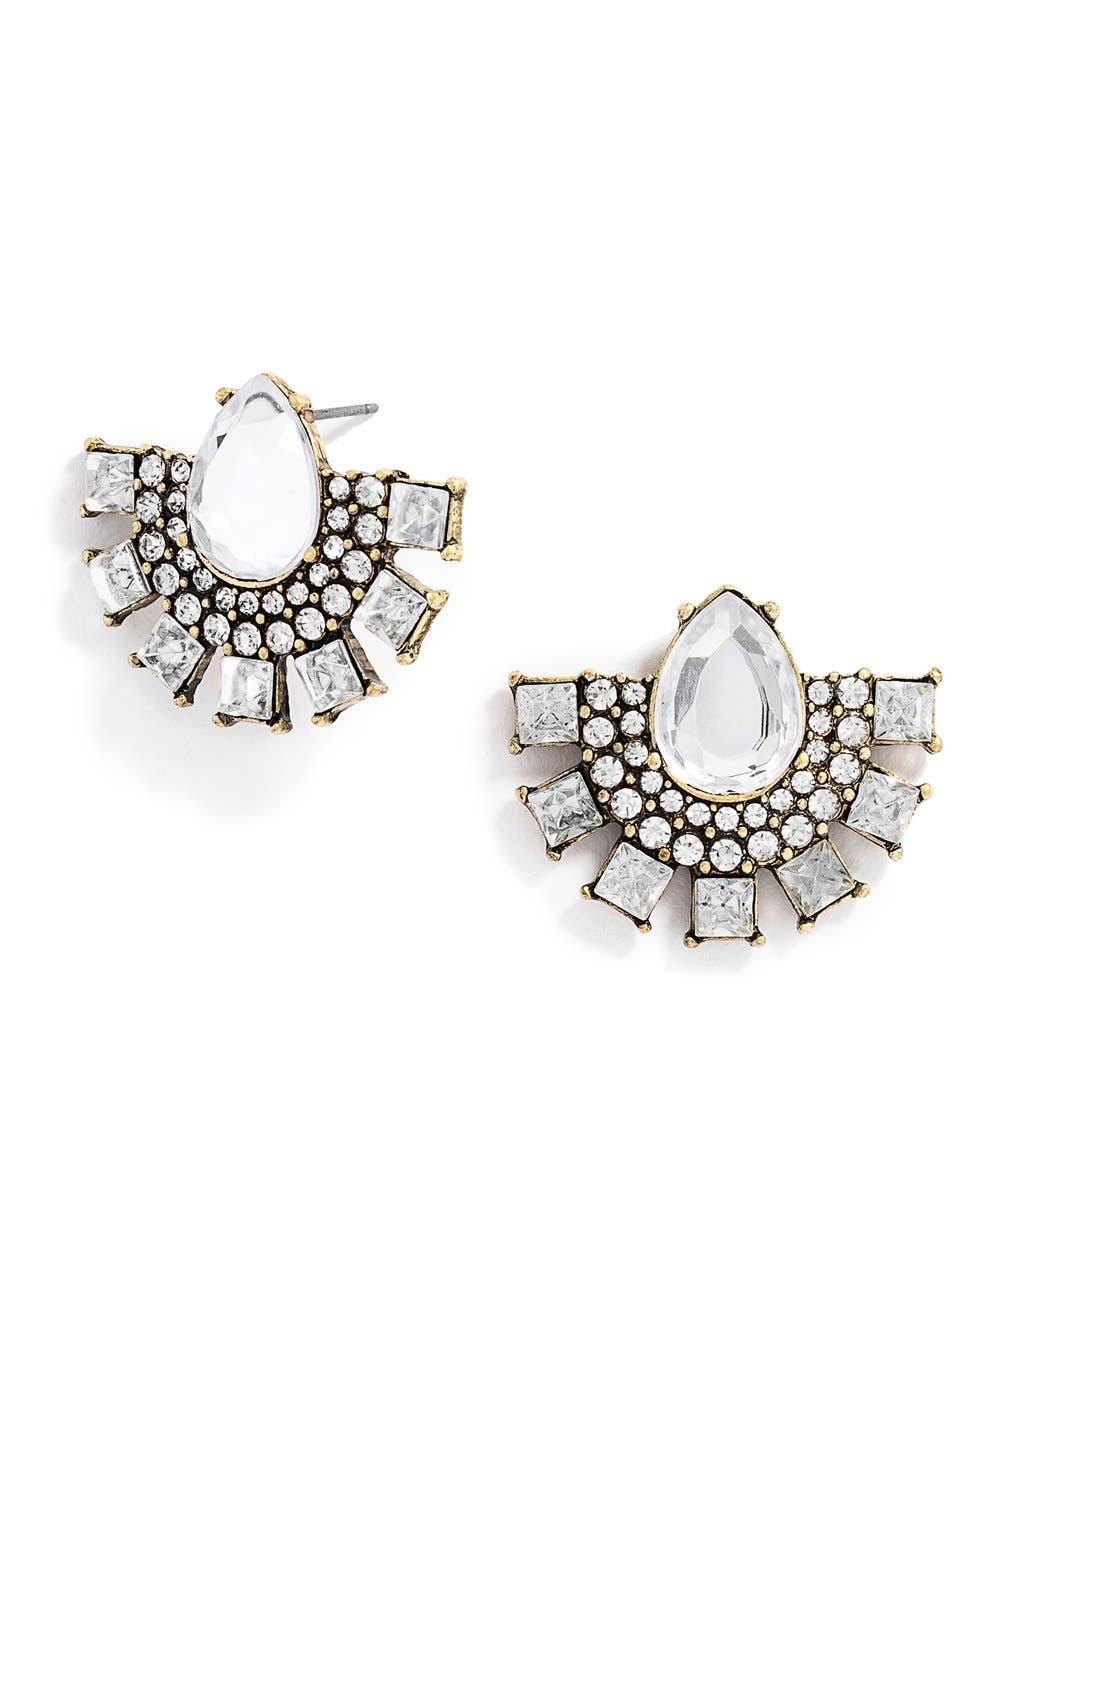 Alternate Image 1 Selected - Baublebar 'Parasol' Statement Stud Earrings